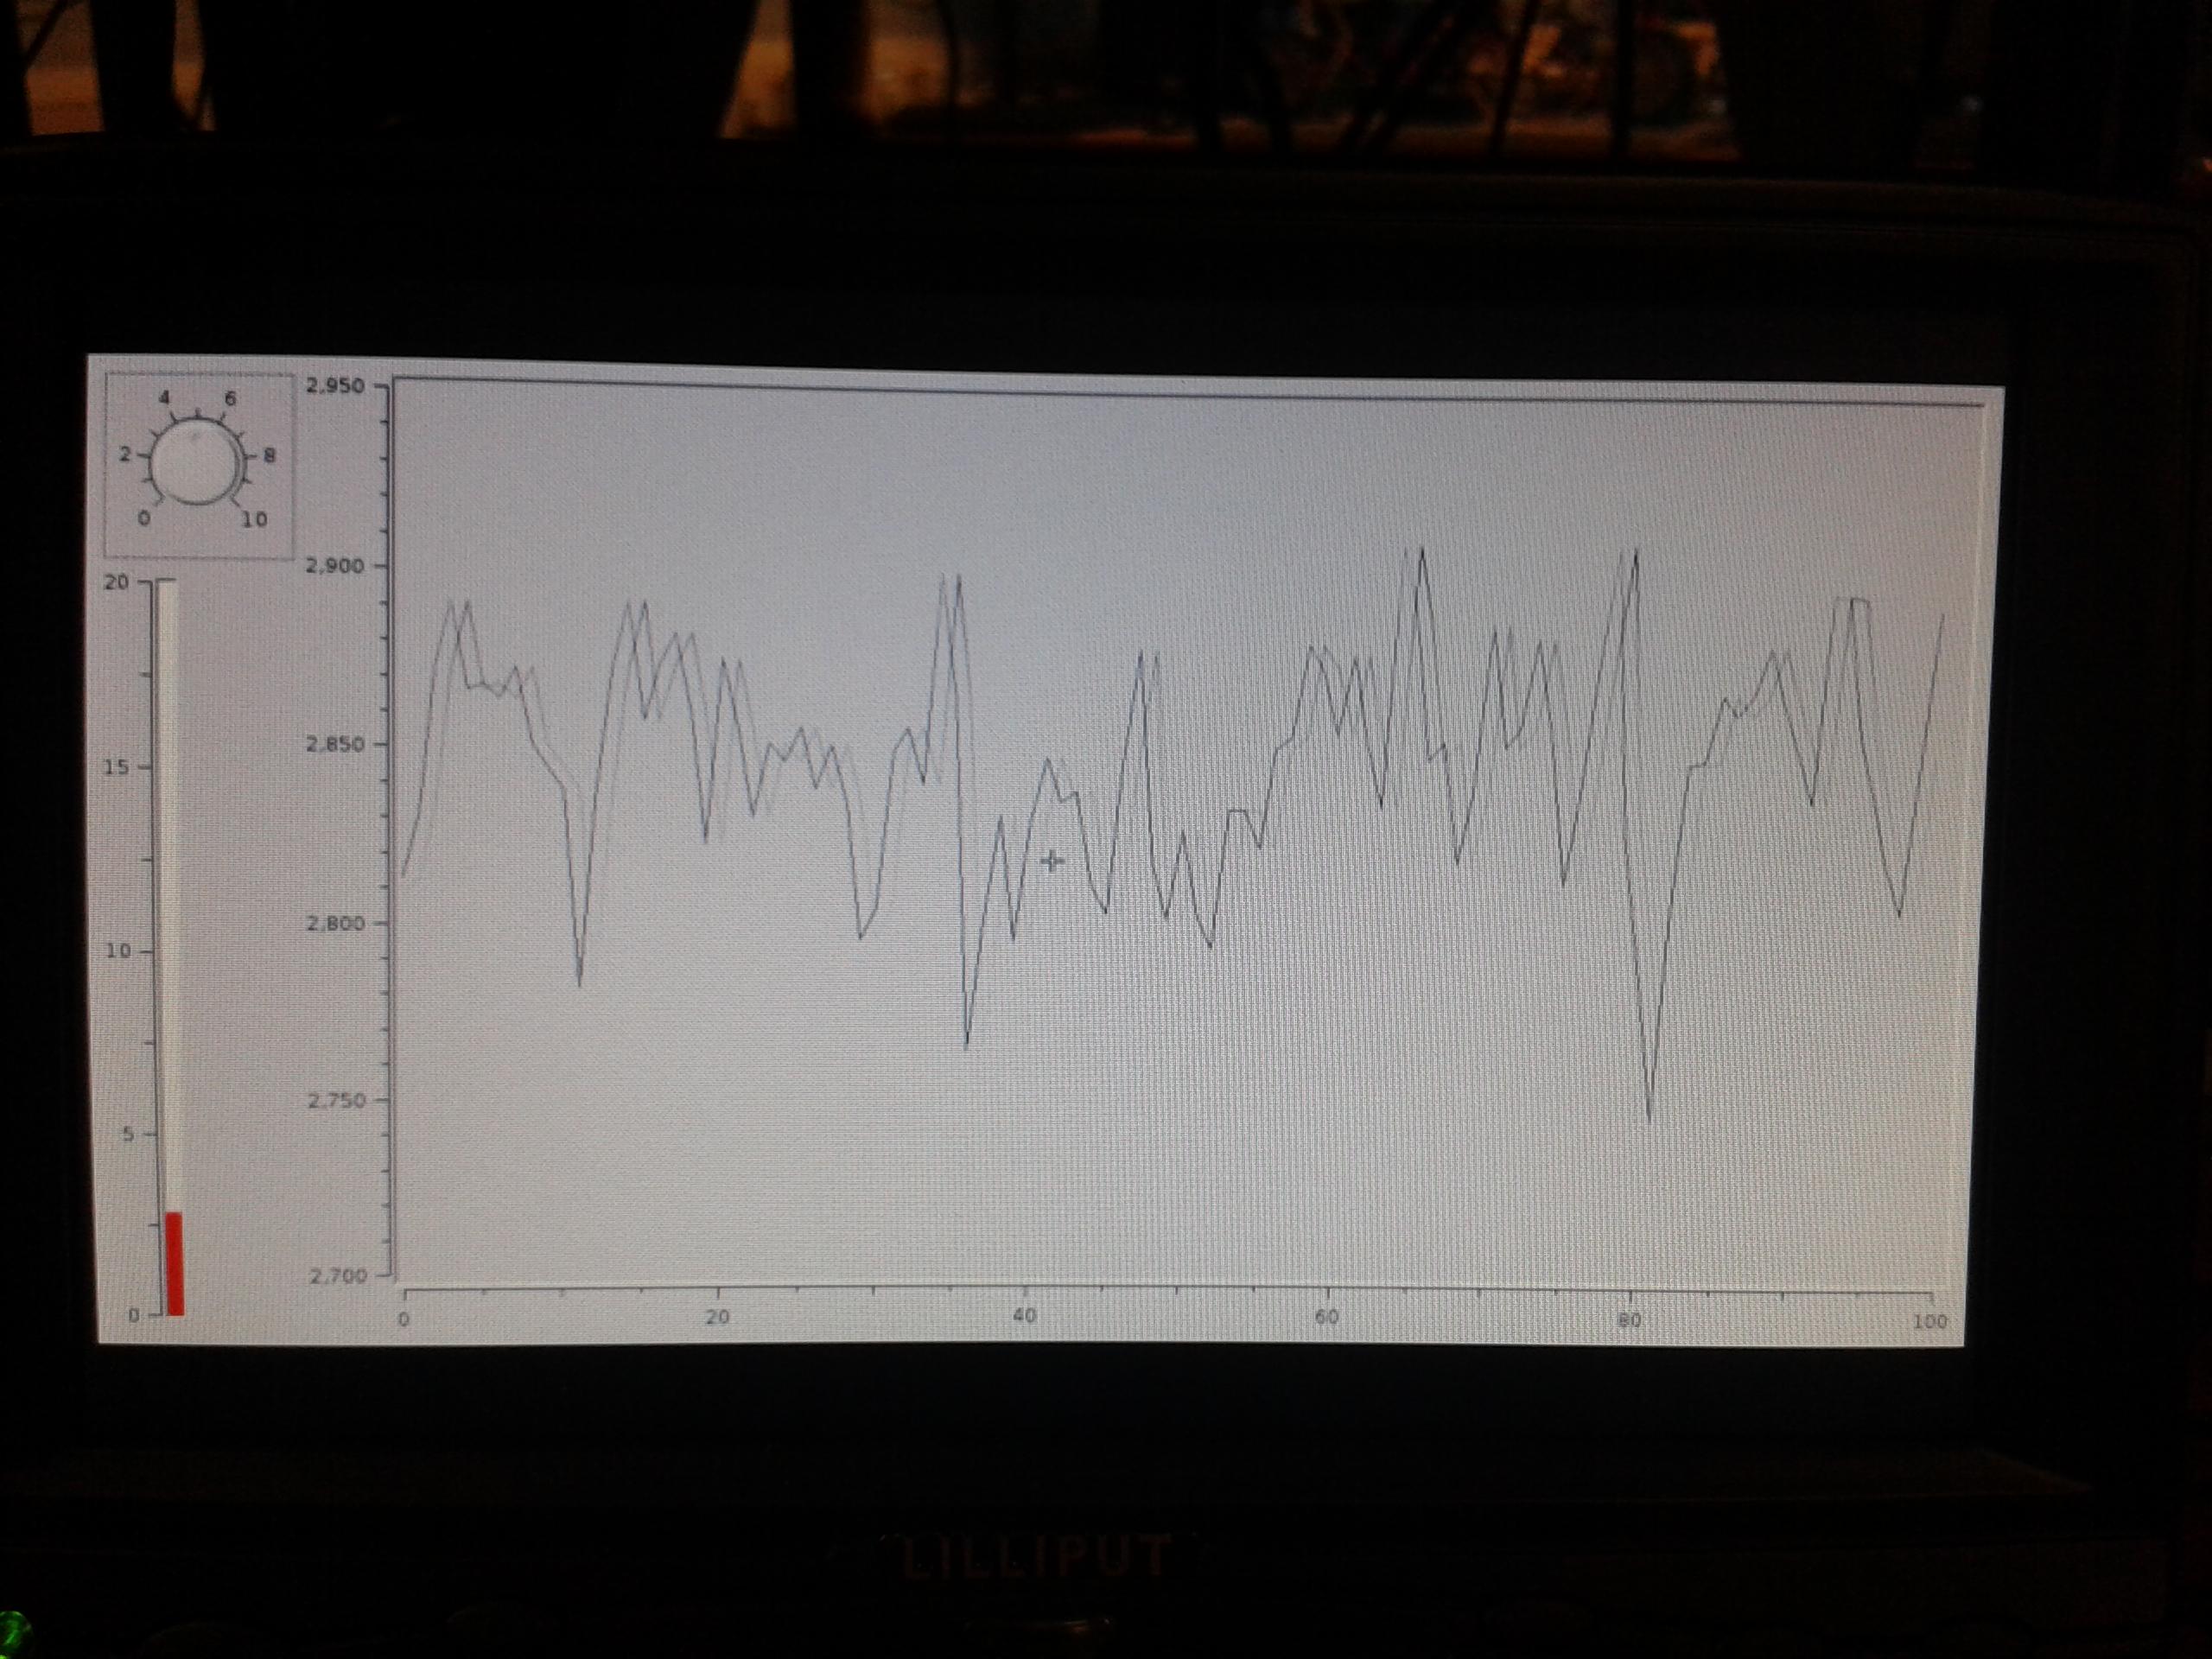 University Of Glasgow School Engineering Raspberry Pi Projects General Purpose Alarm Circuit For Resistive Sensor Figure 4 Waveform Before The Application Pressure